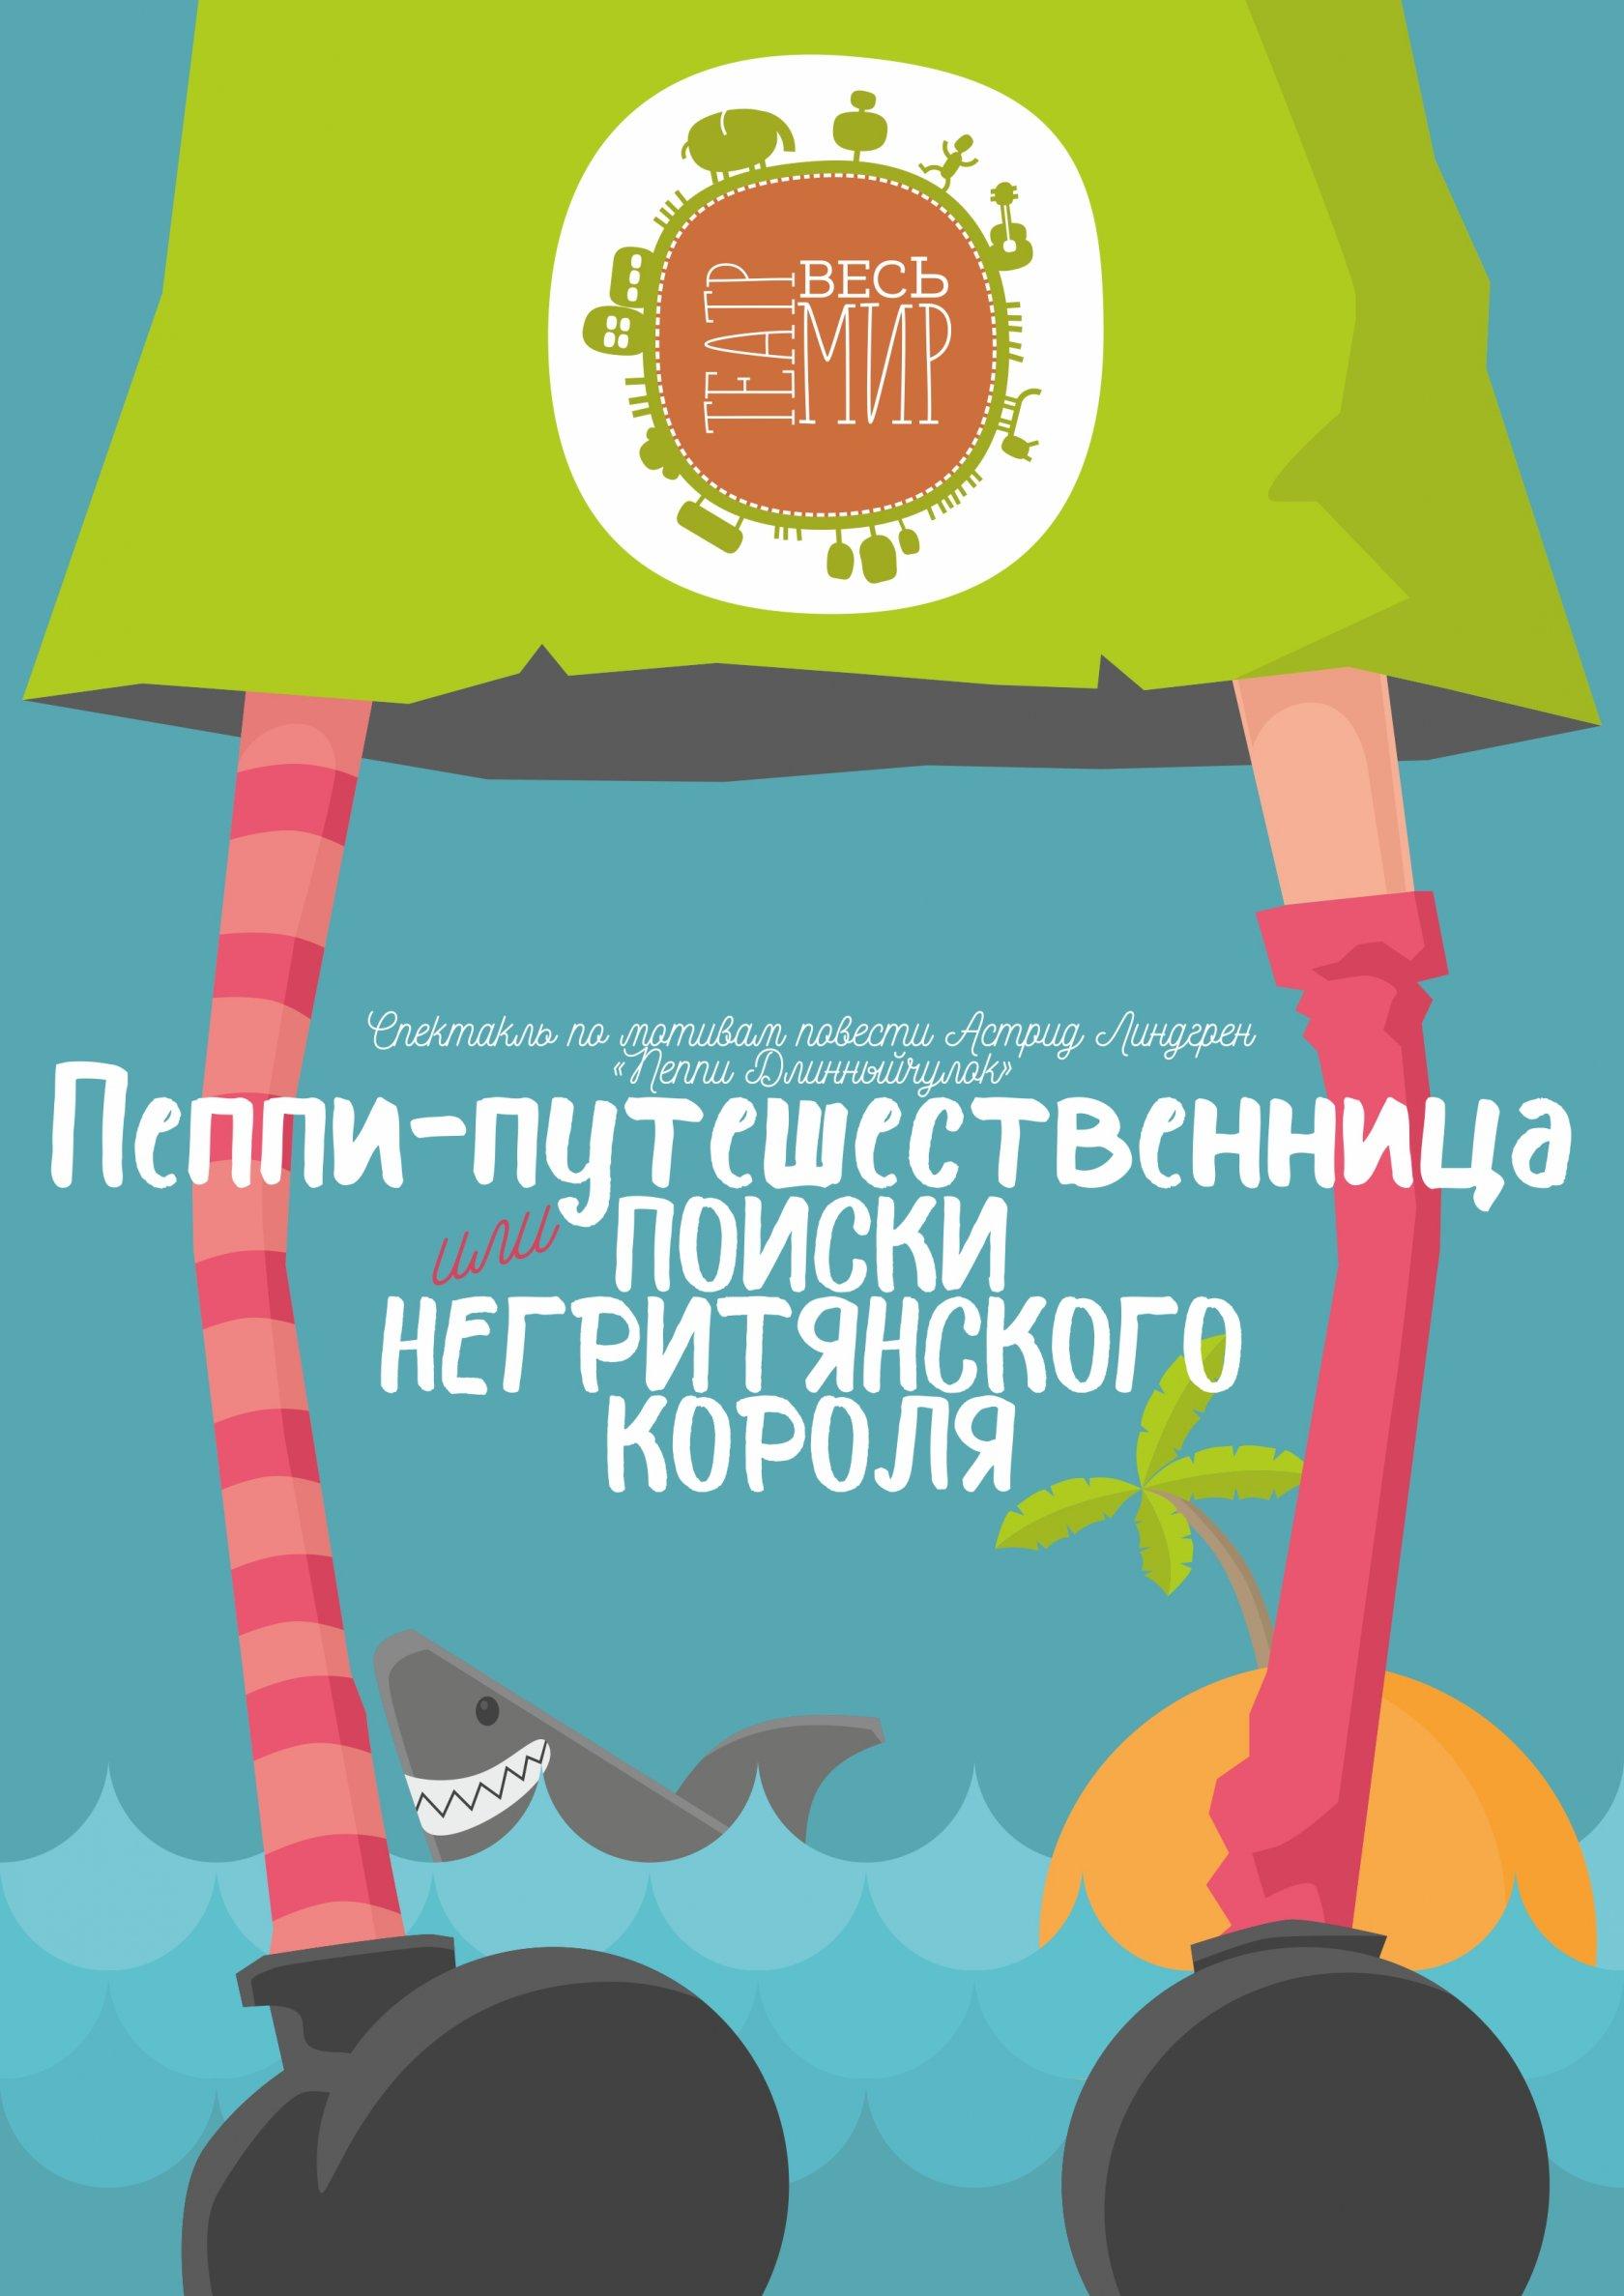 Театр афиша расписание чебоксары афиша концертов 2017